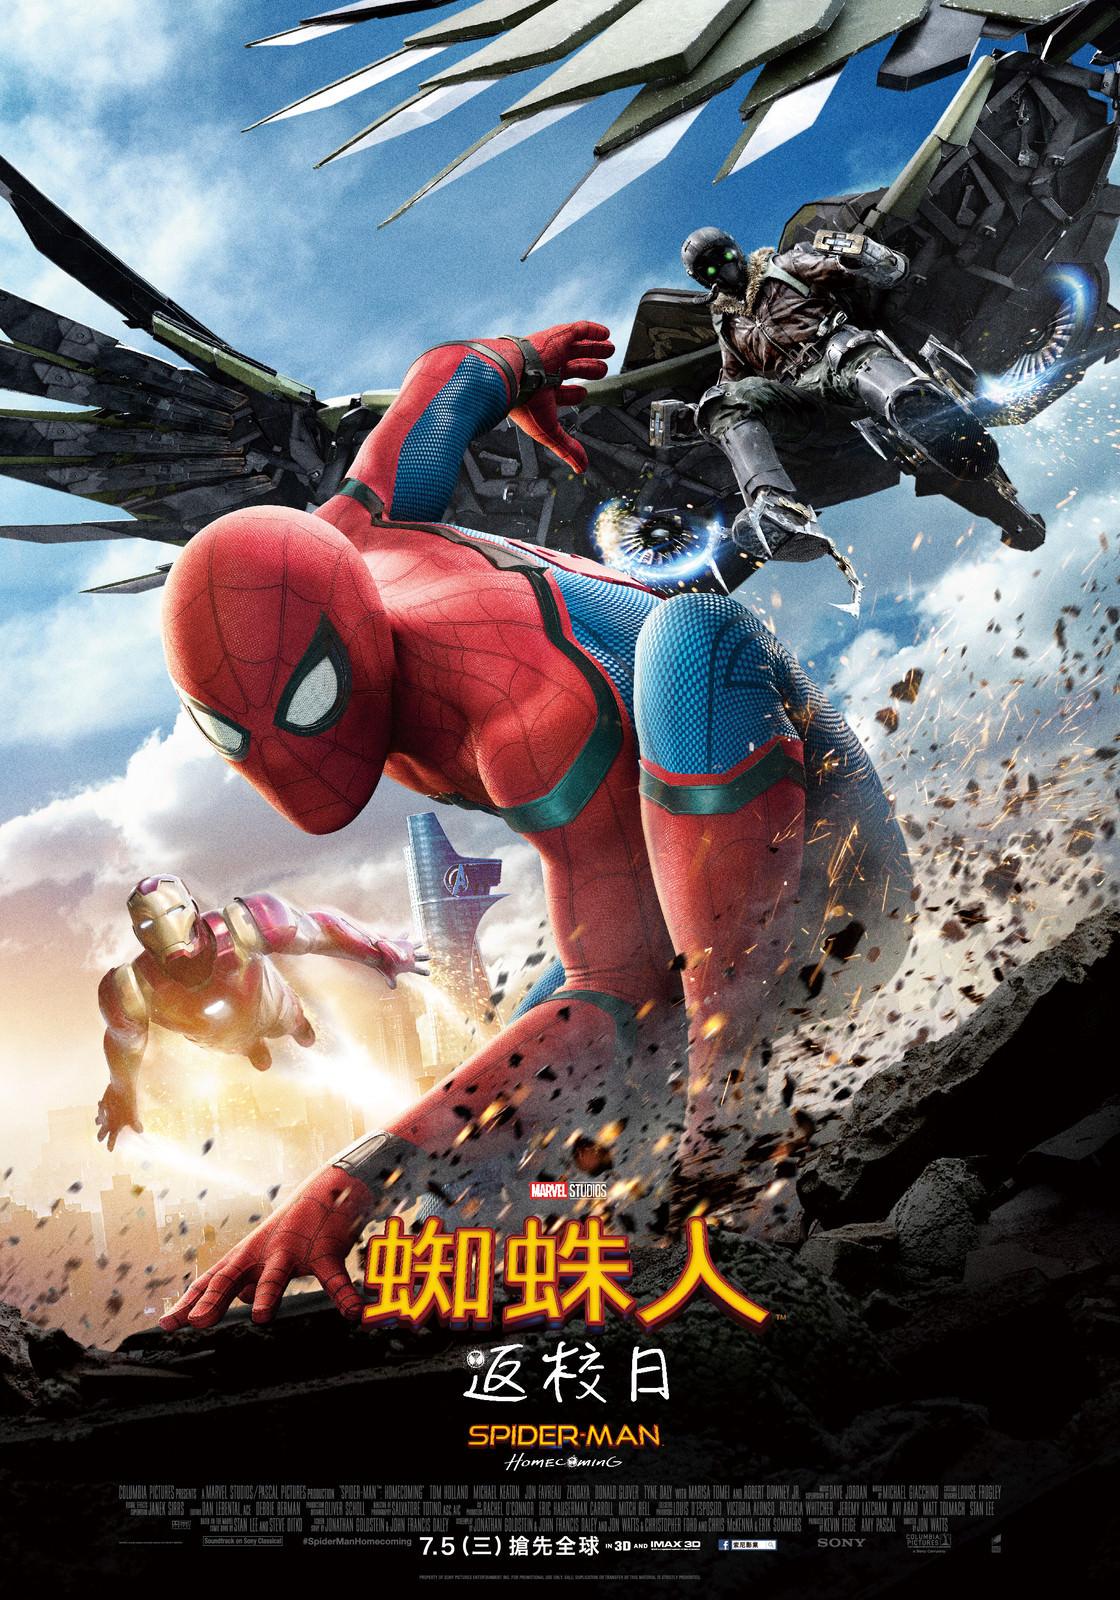 Movie, Spider-Man: Homecoming(美國, 2017年) / 蜘蛛人:返校日(台灣) / 蜘蛛侠:英雄归来(中國) / 蜘蛛俠:強勢回歸(香港), 電影海報, 台灣